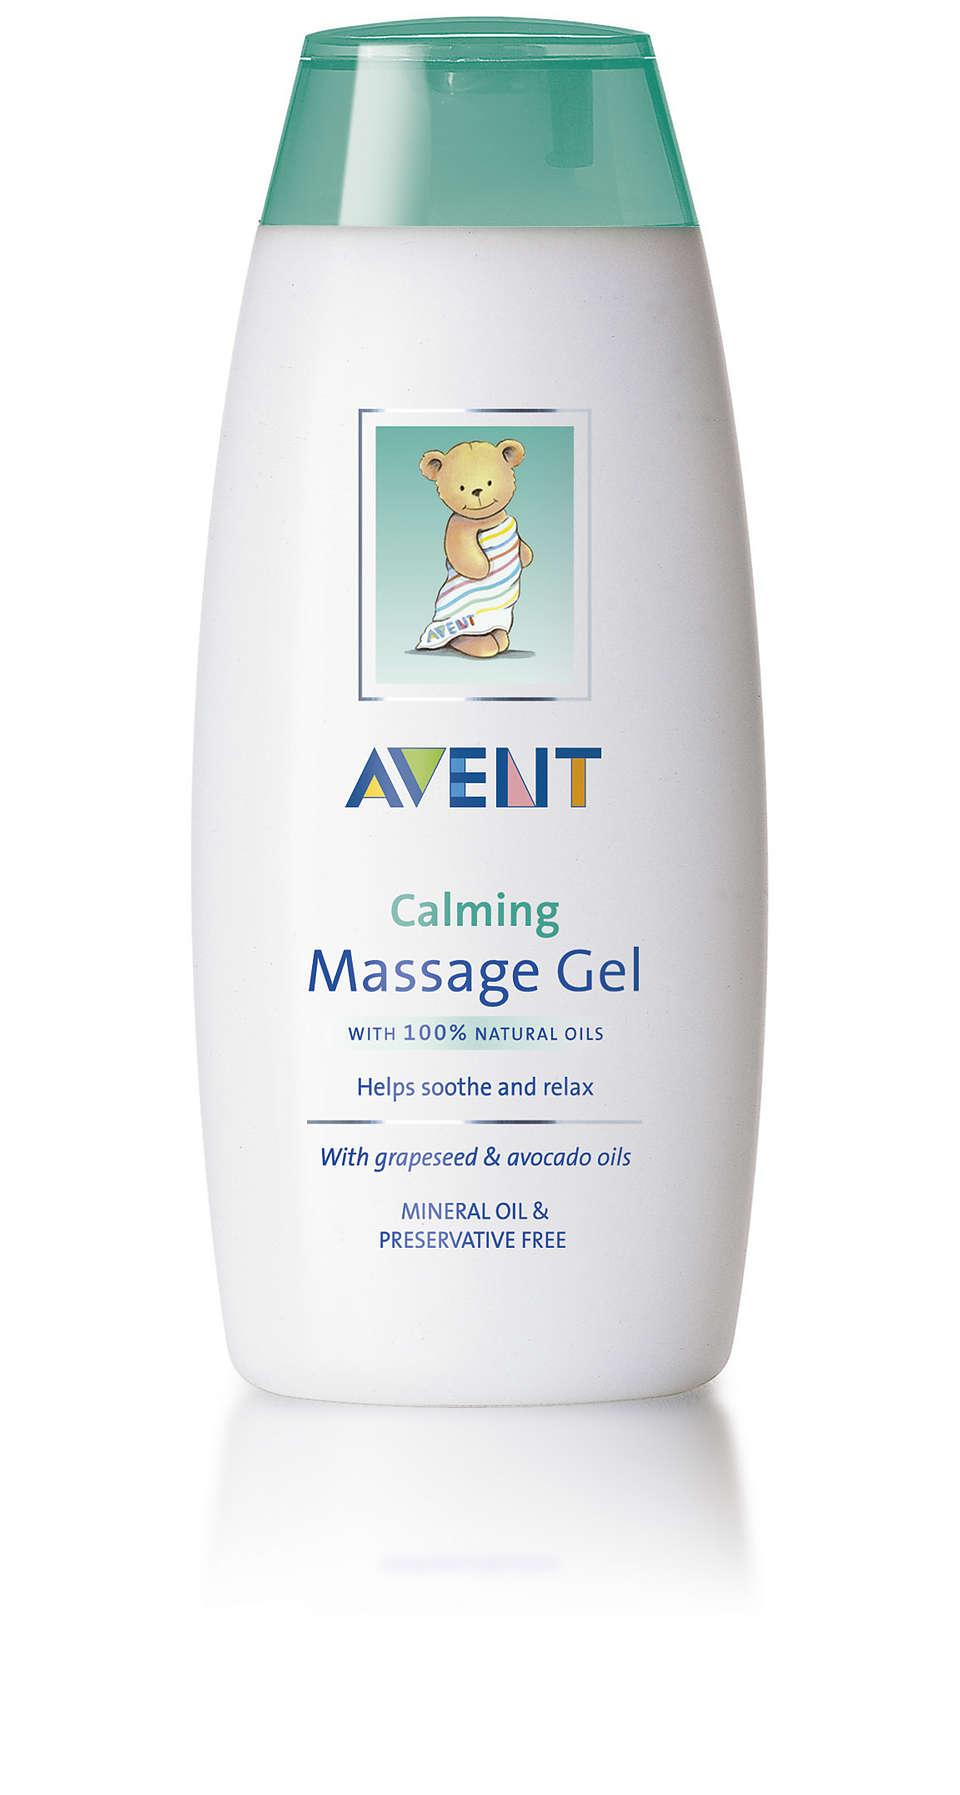 Calms, moisturises, helps soothe to sleep